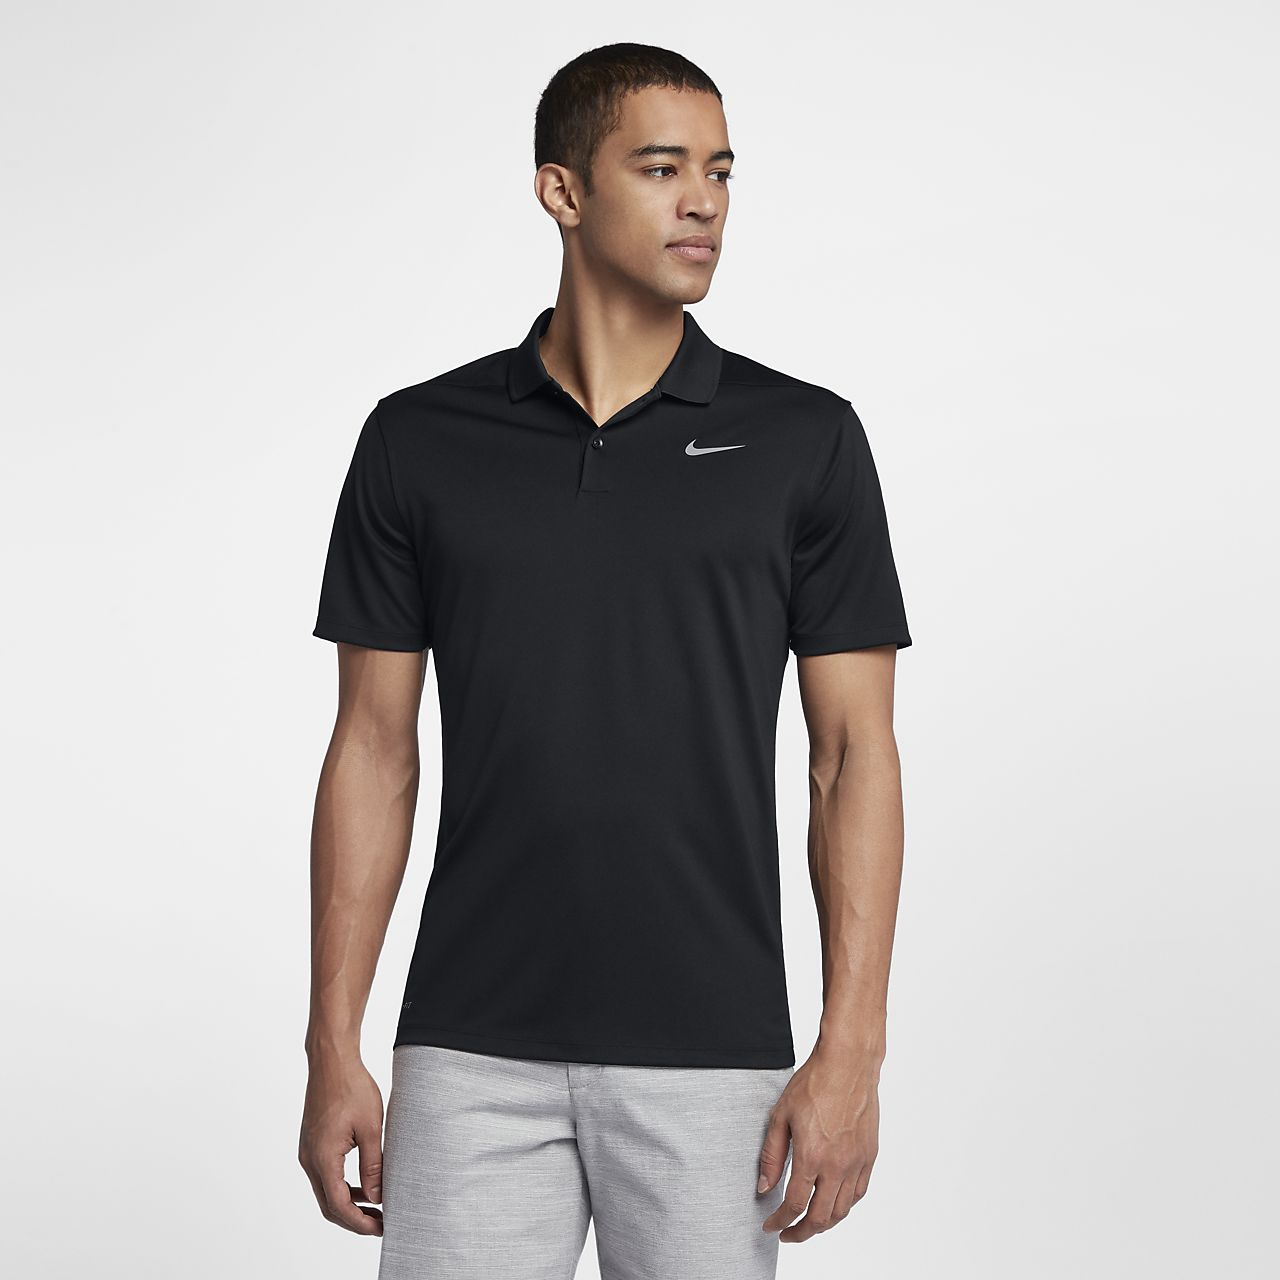 e1694b65 Nike Dri-FIT Victory Men's Slim-Fit Golf Polo. Nike.com MY